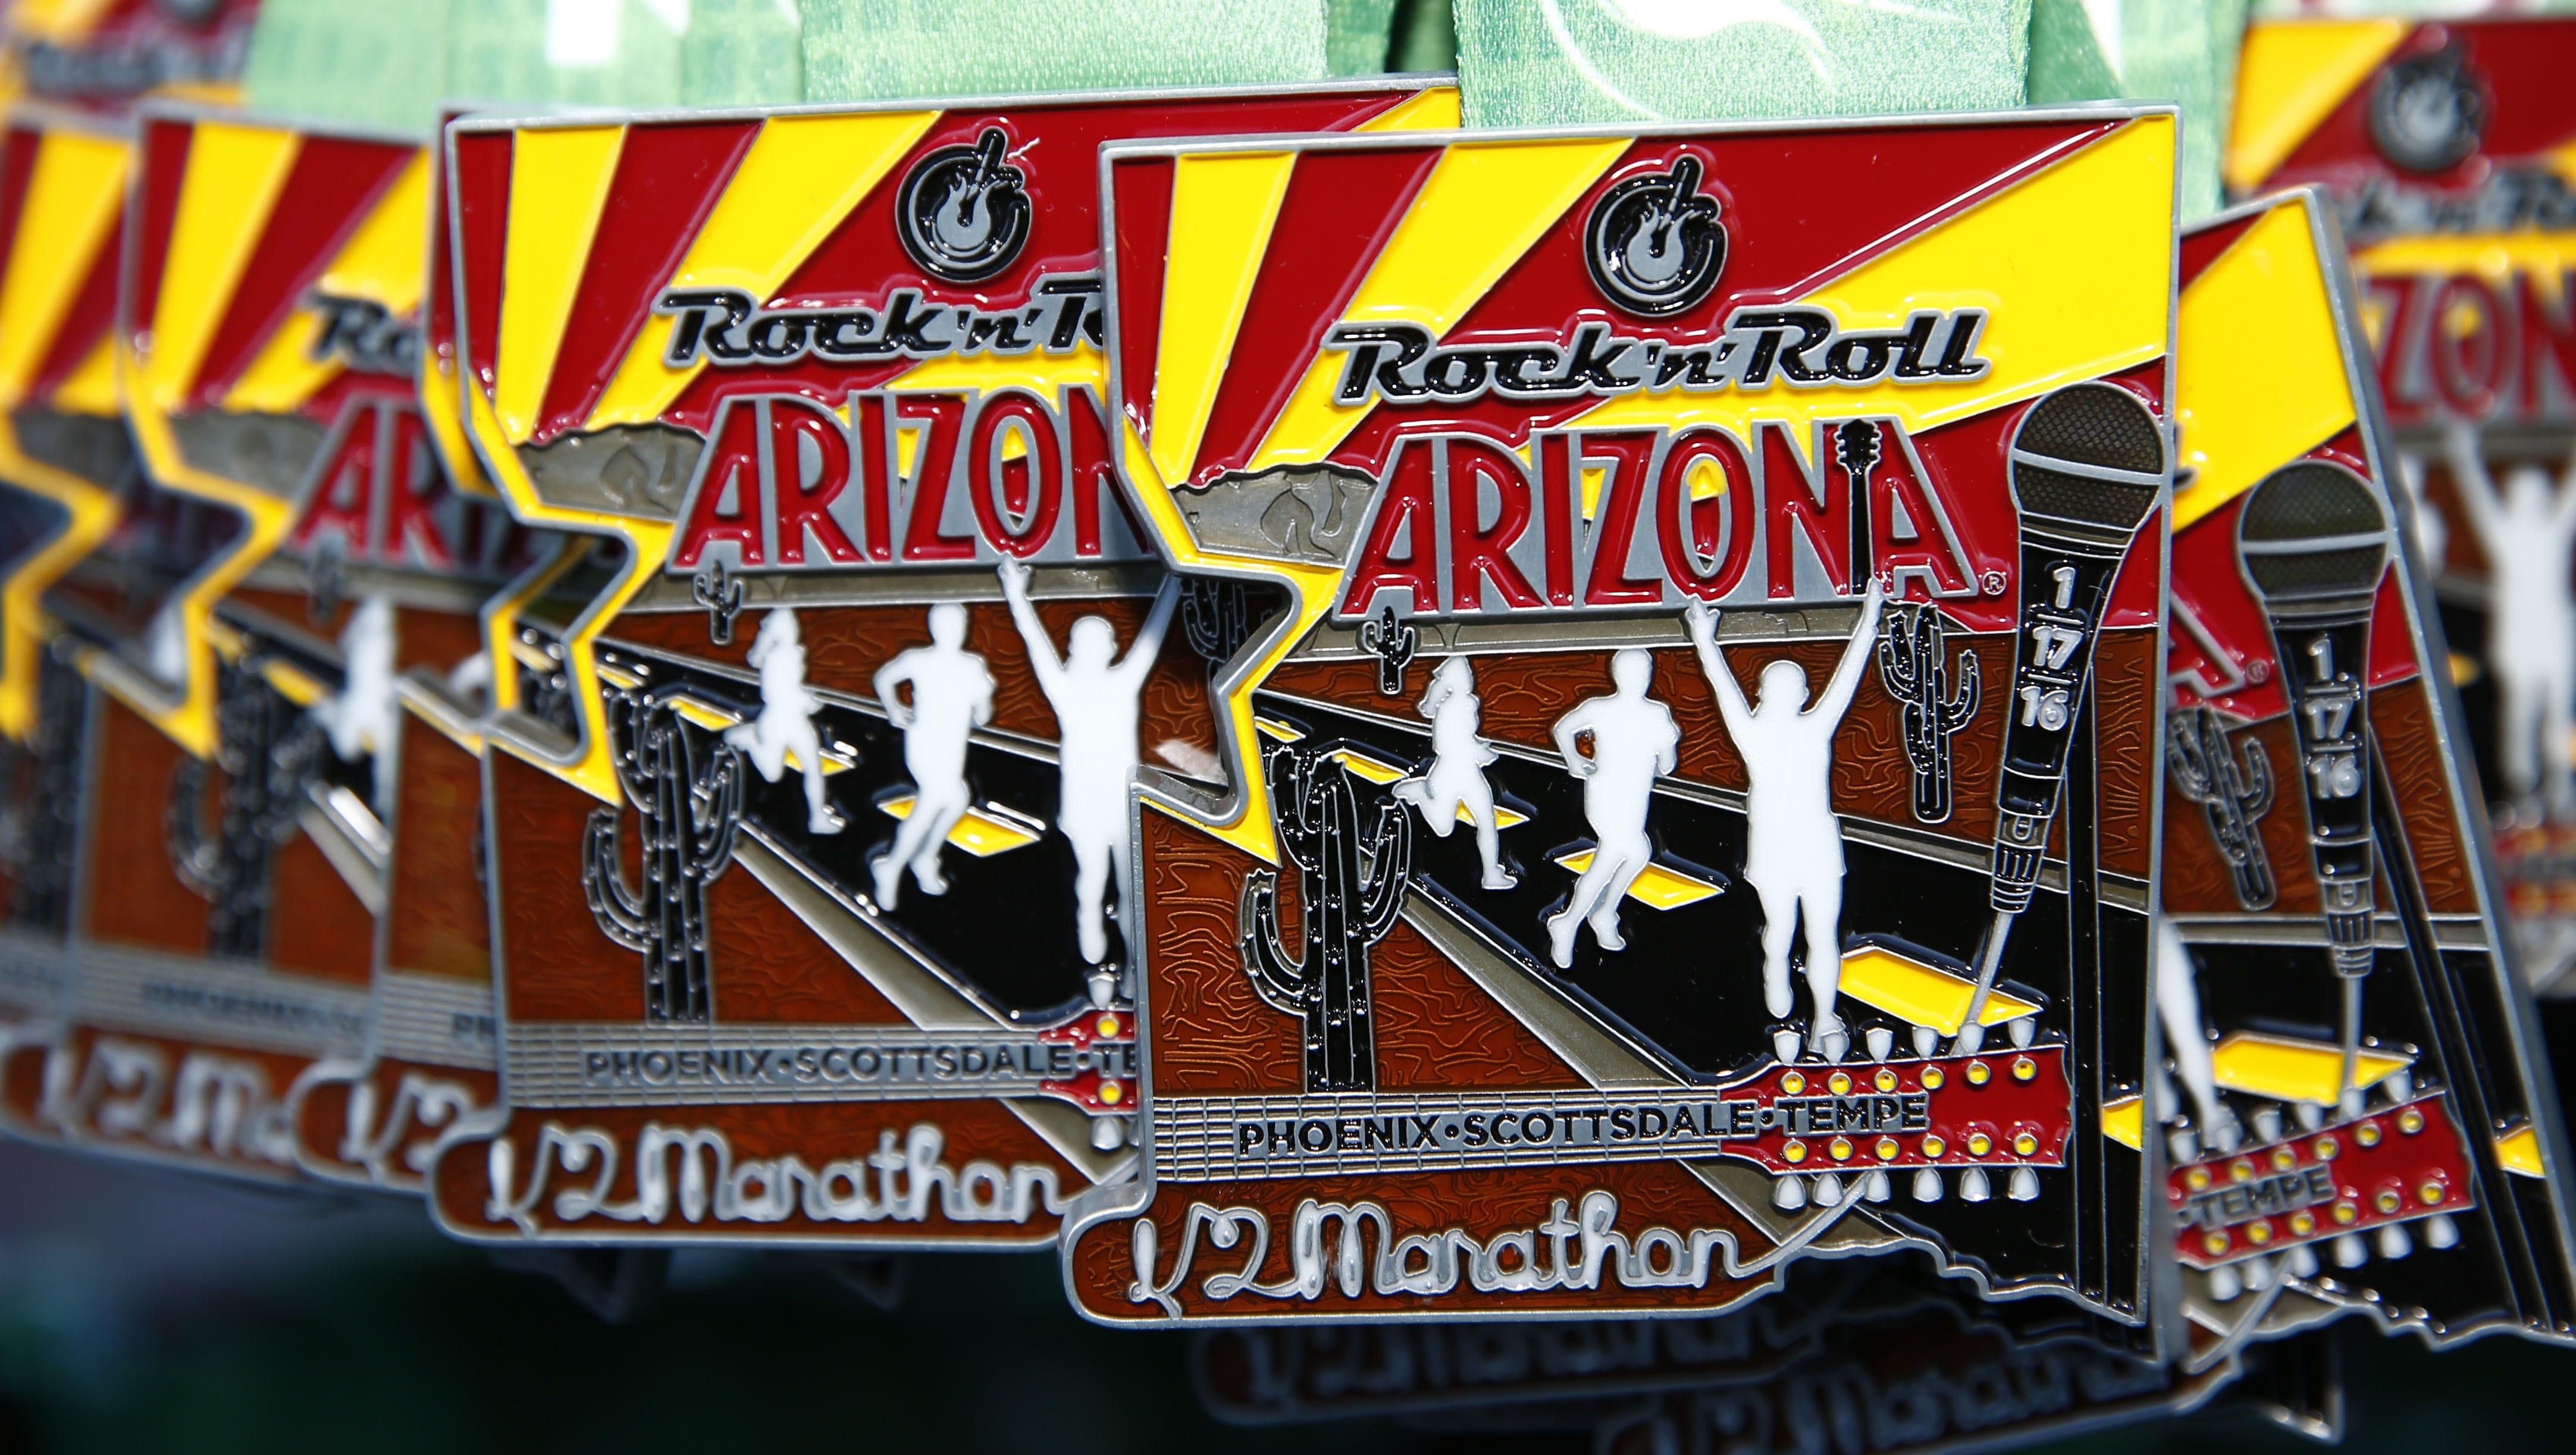 rock n roll arizona marathon mens results 2016 rock n roll arizona marathon mens